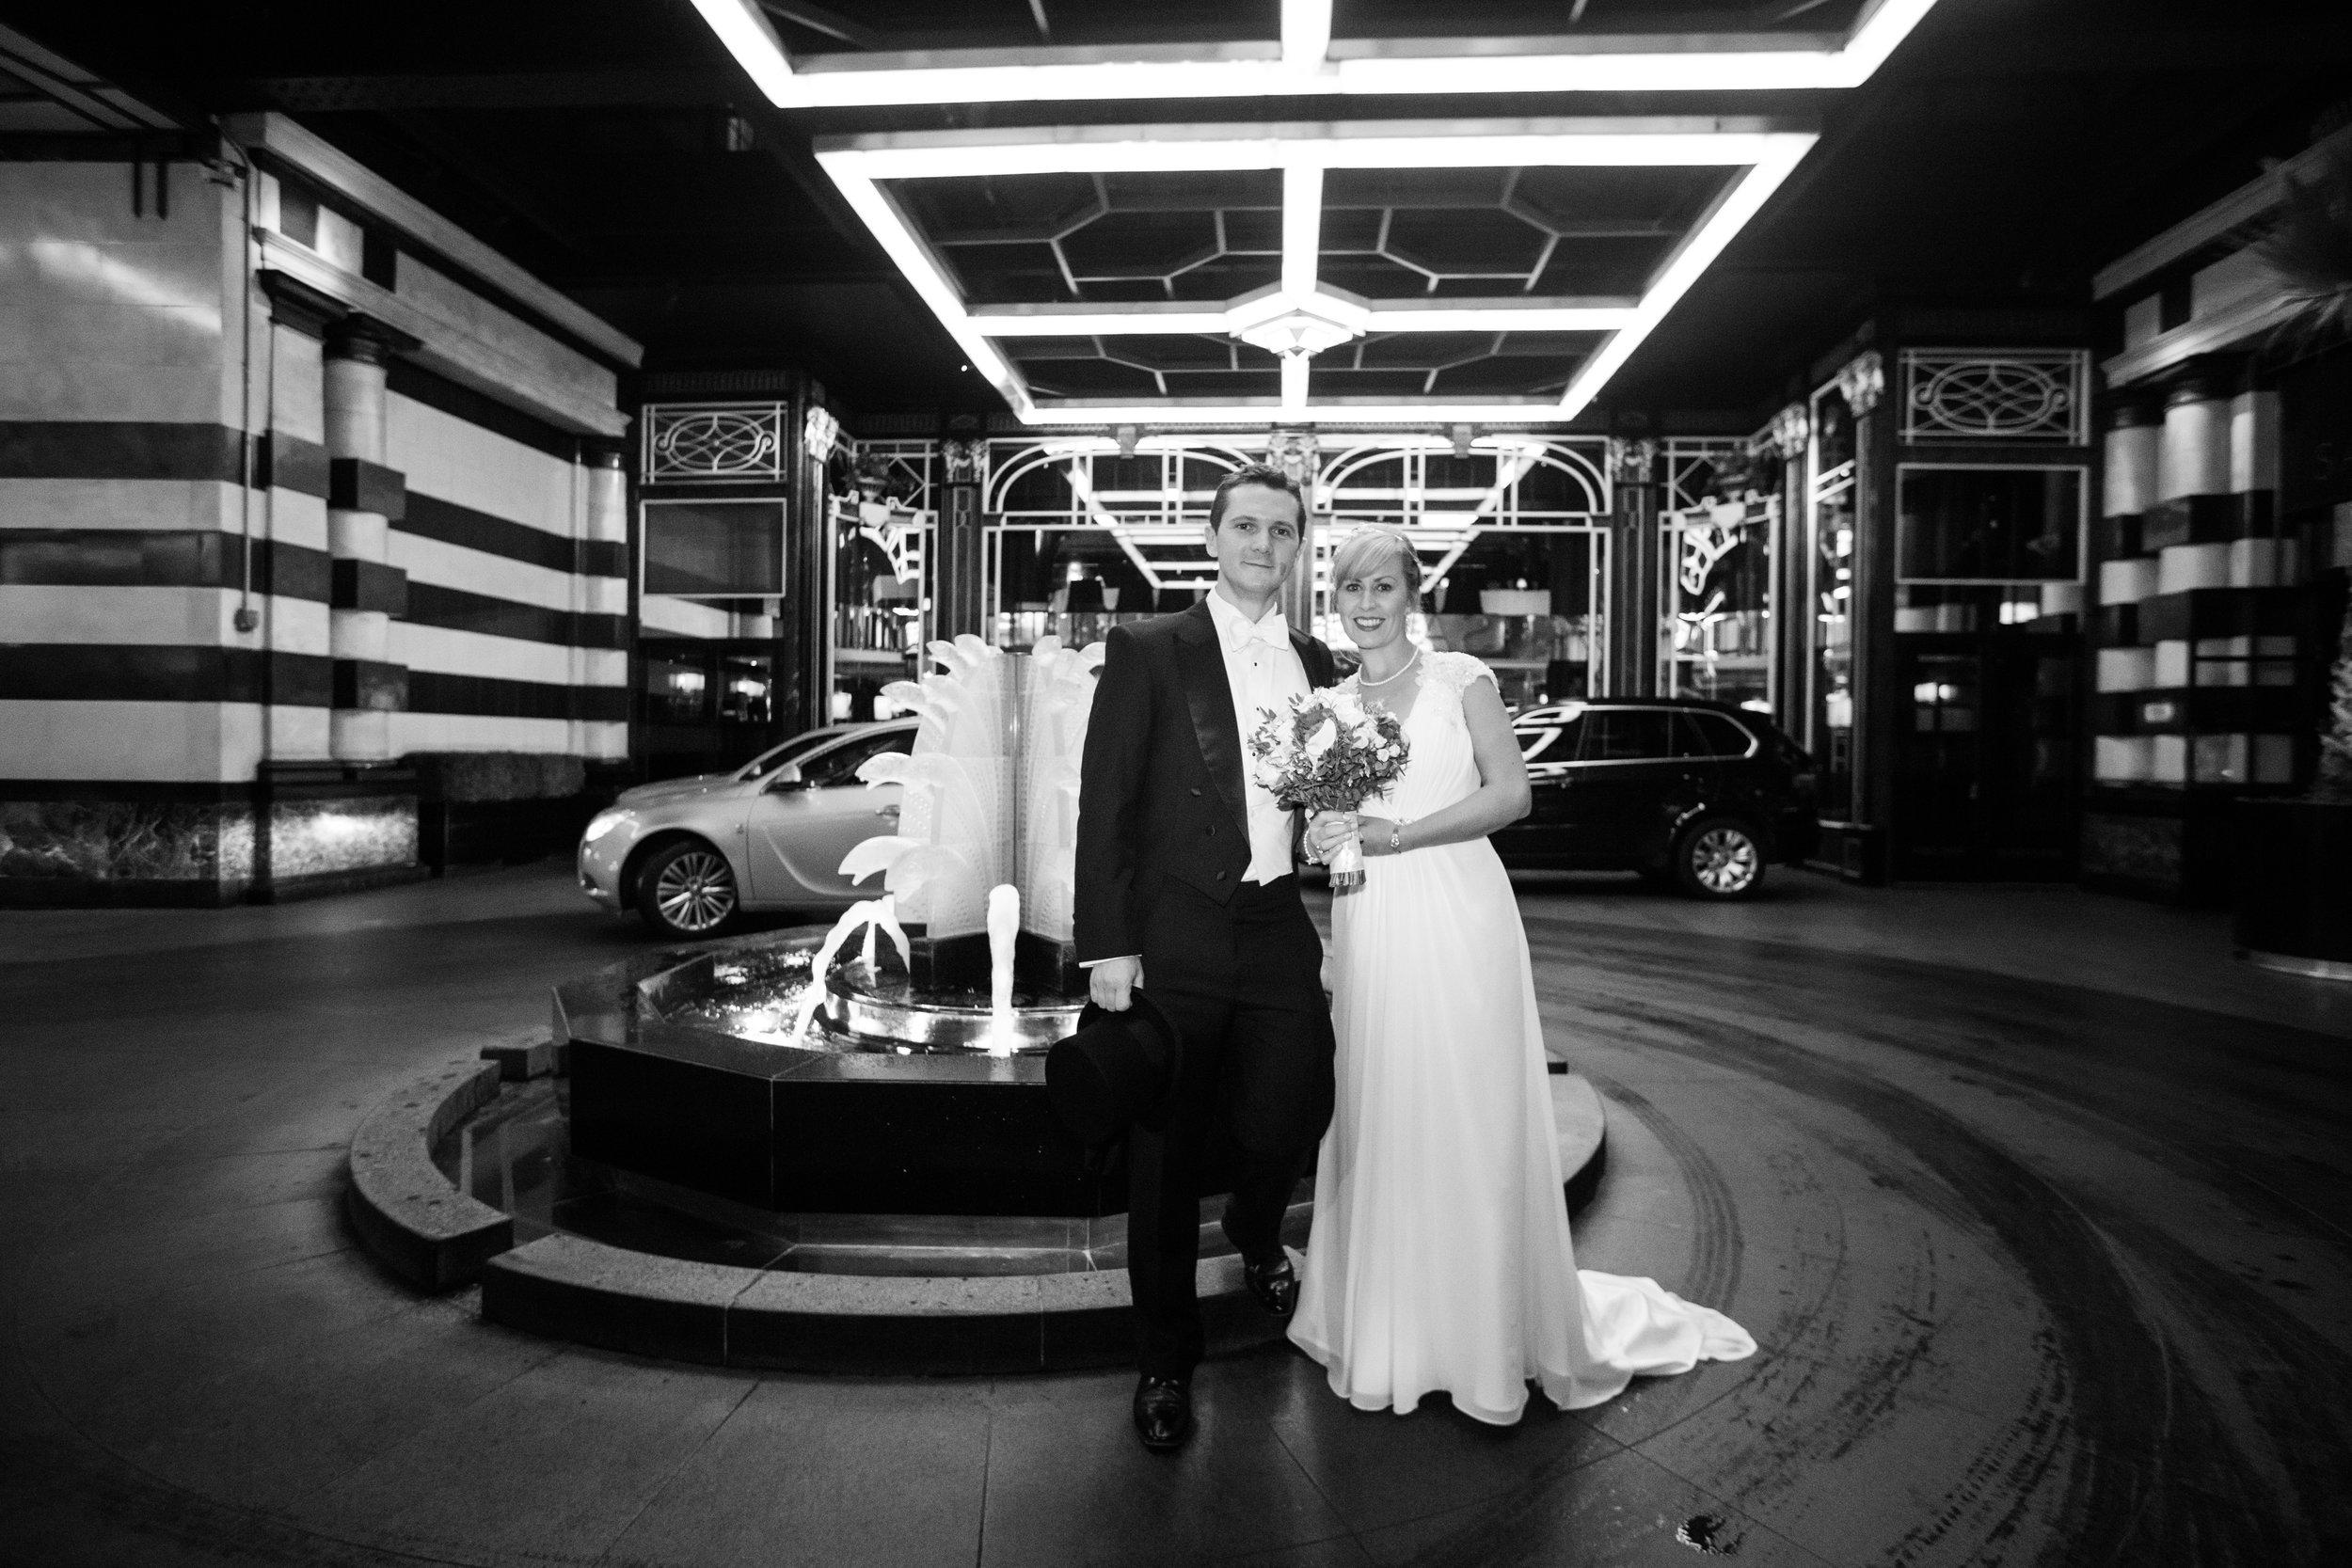 london-wedding-photography-wimbledon-wandsworth-town-hall-savoy-hotel-foyer-94